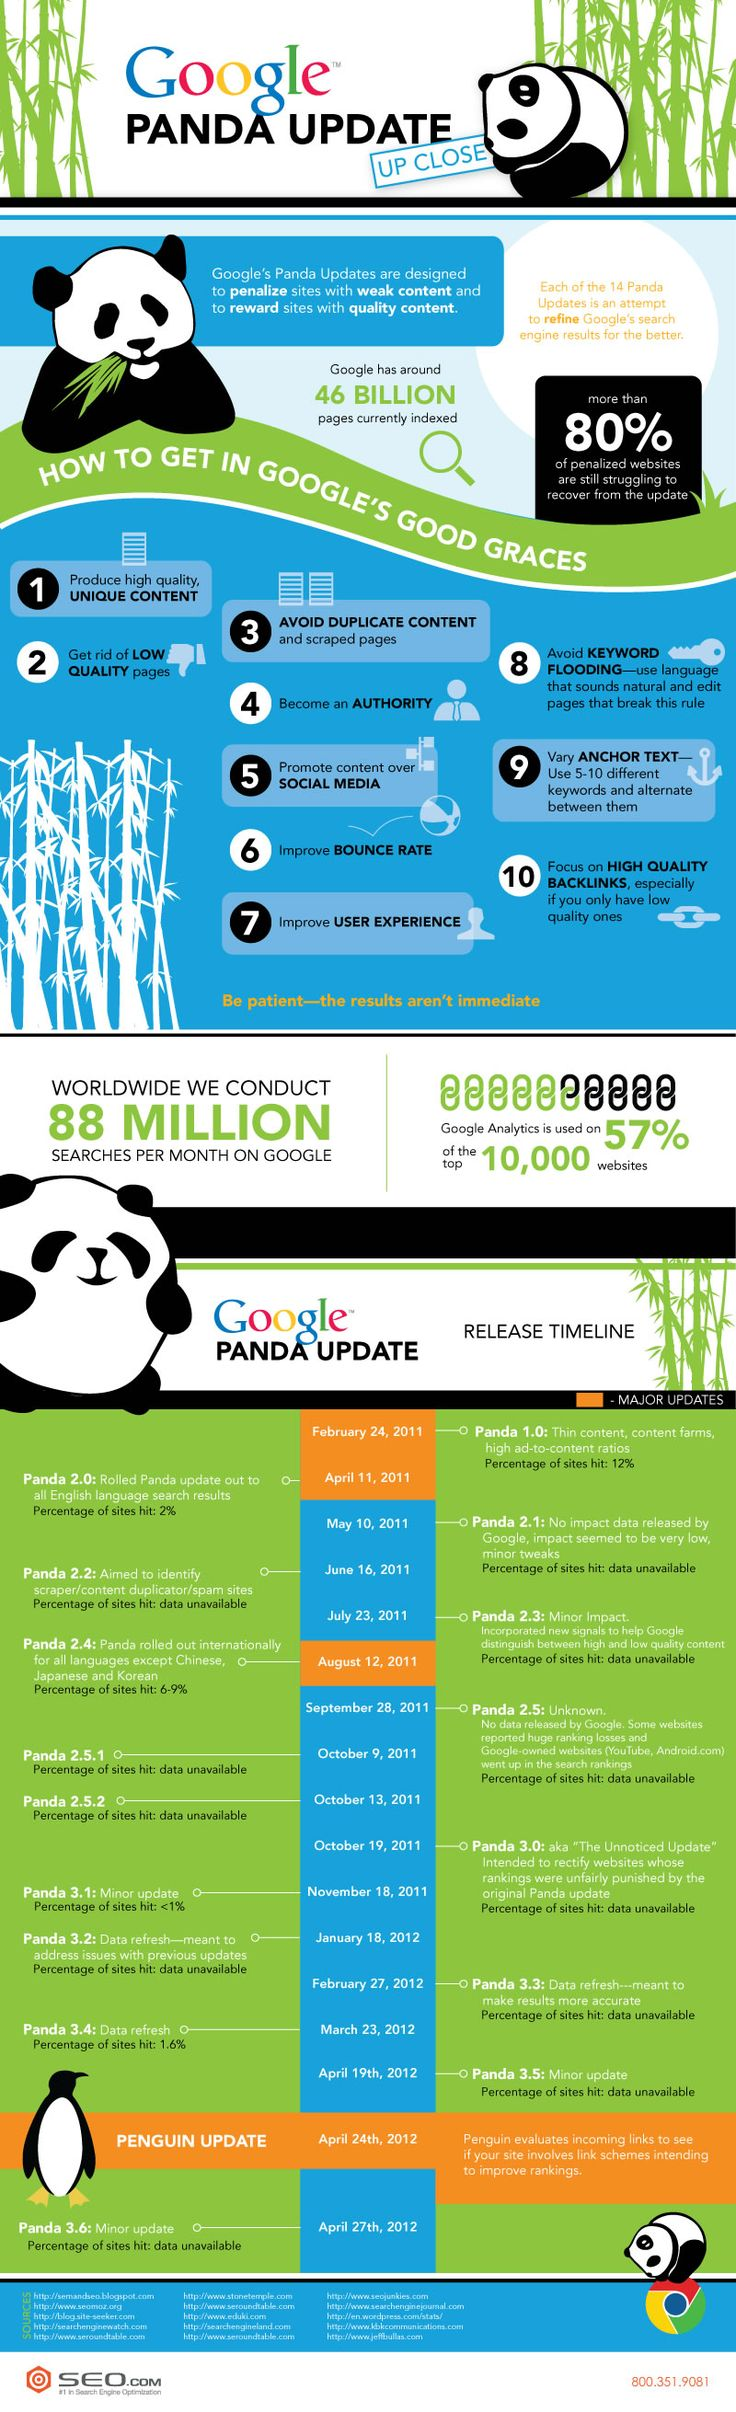 Google-Panda-Update-Up-Close-Infographic